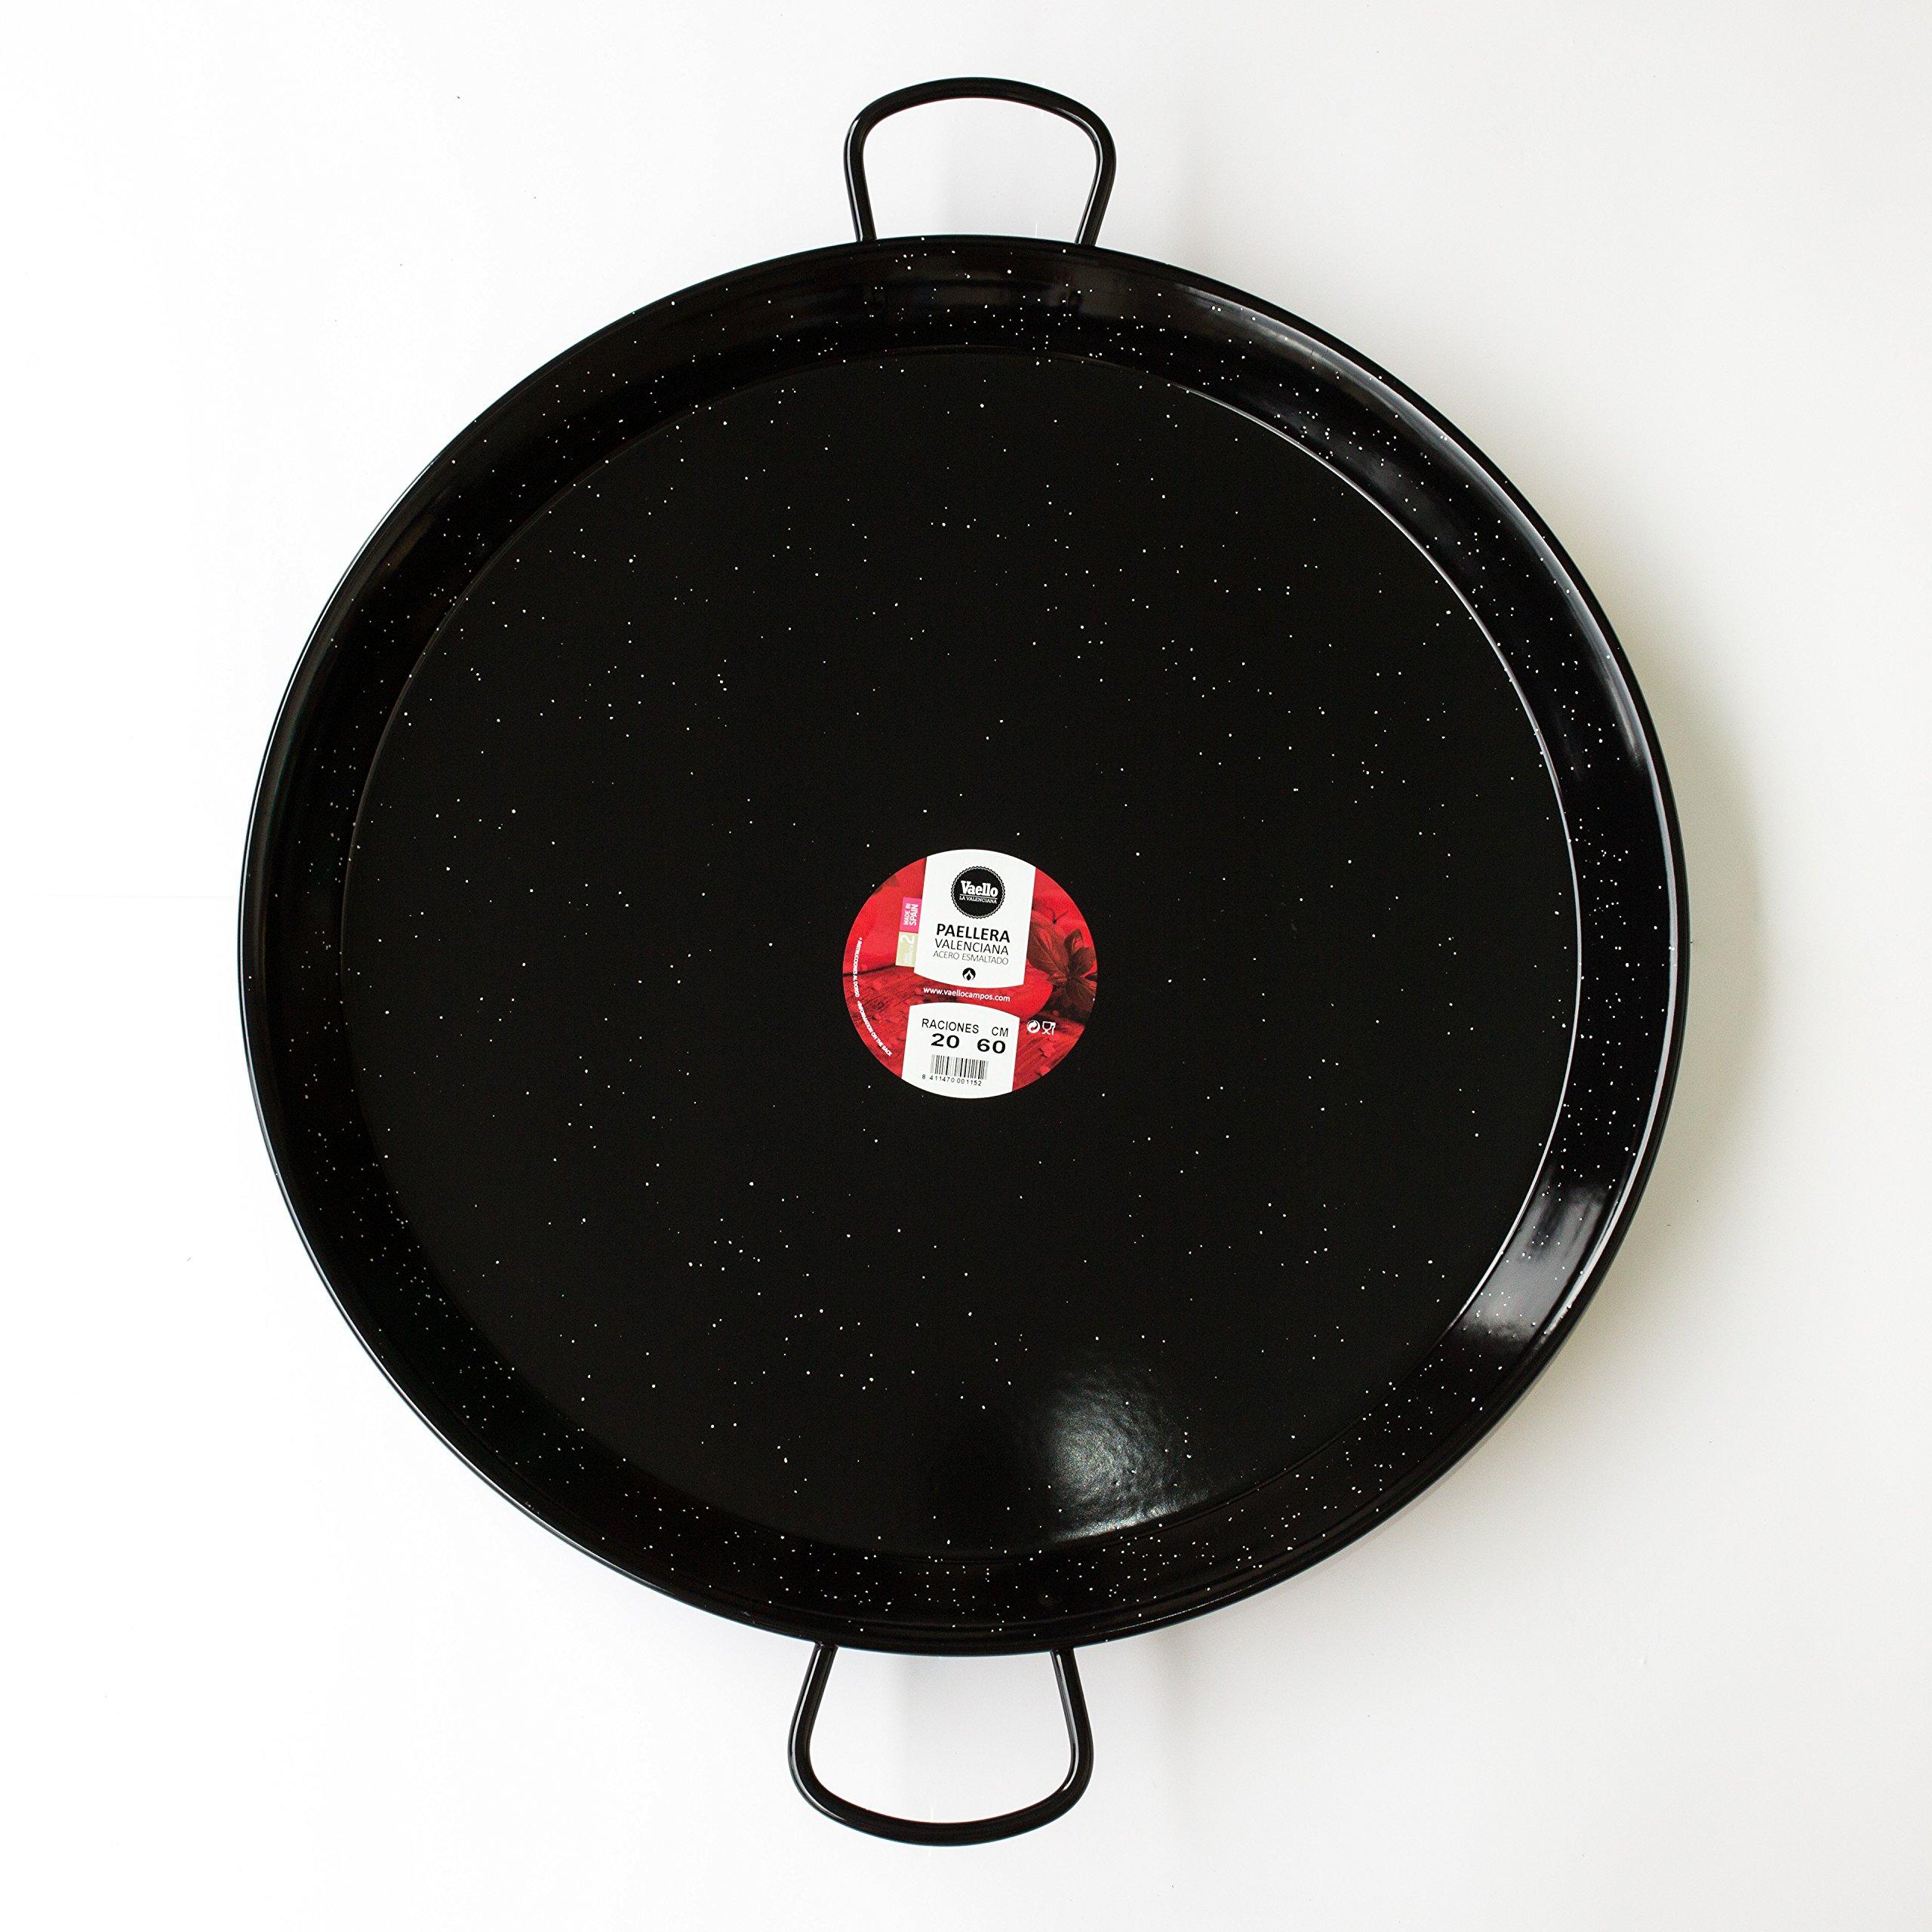 Enamelled Steel Valencian paella pan. 24Inch / 60cm / 20 Servings